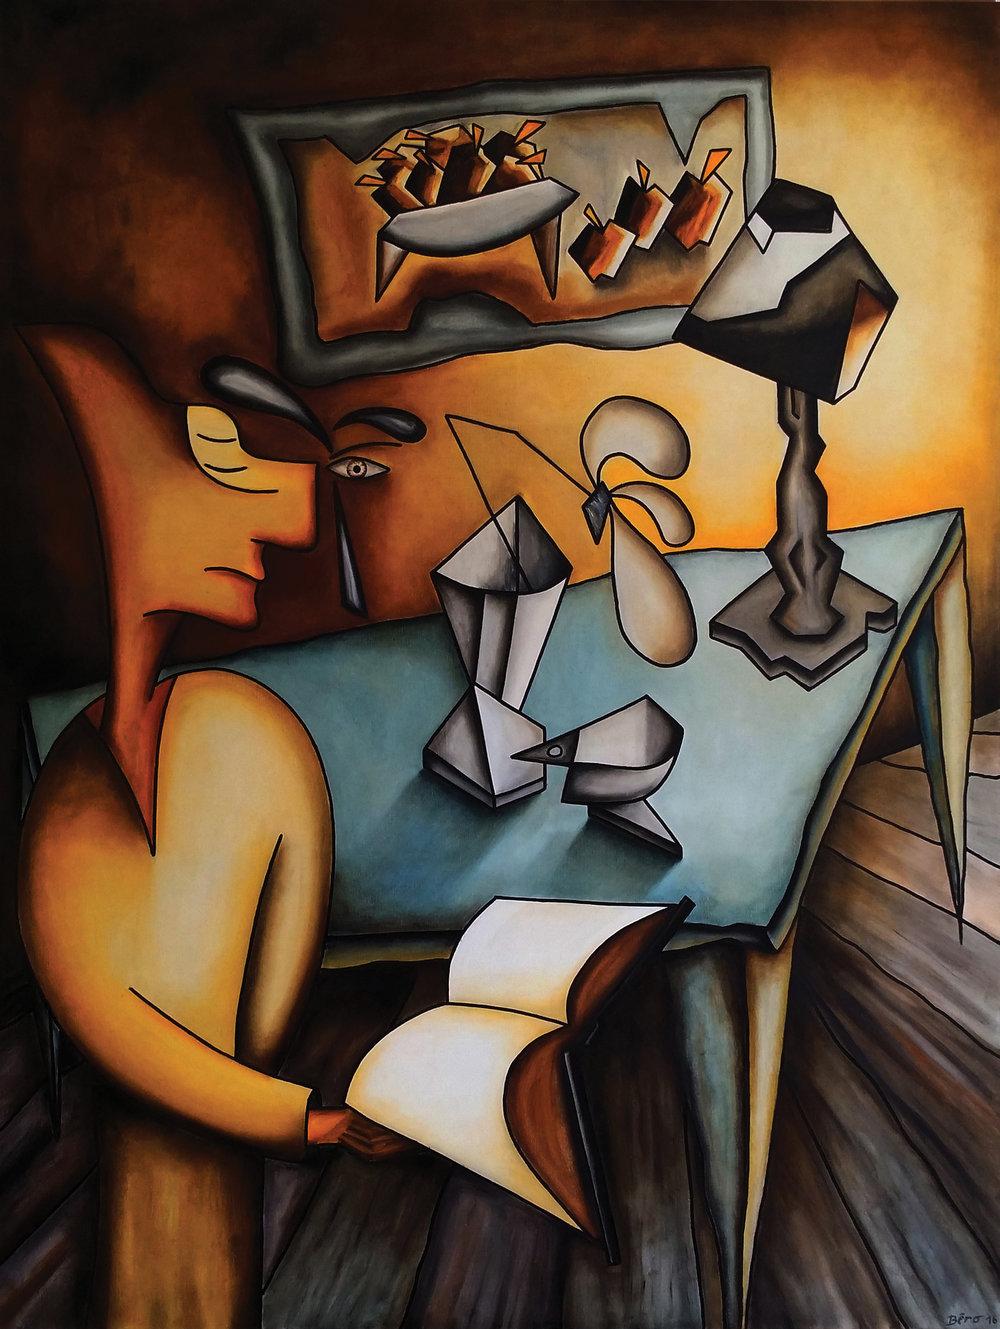 La Connaissance , 59'' by 78'' by Alain Beraud